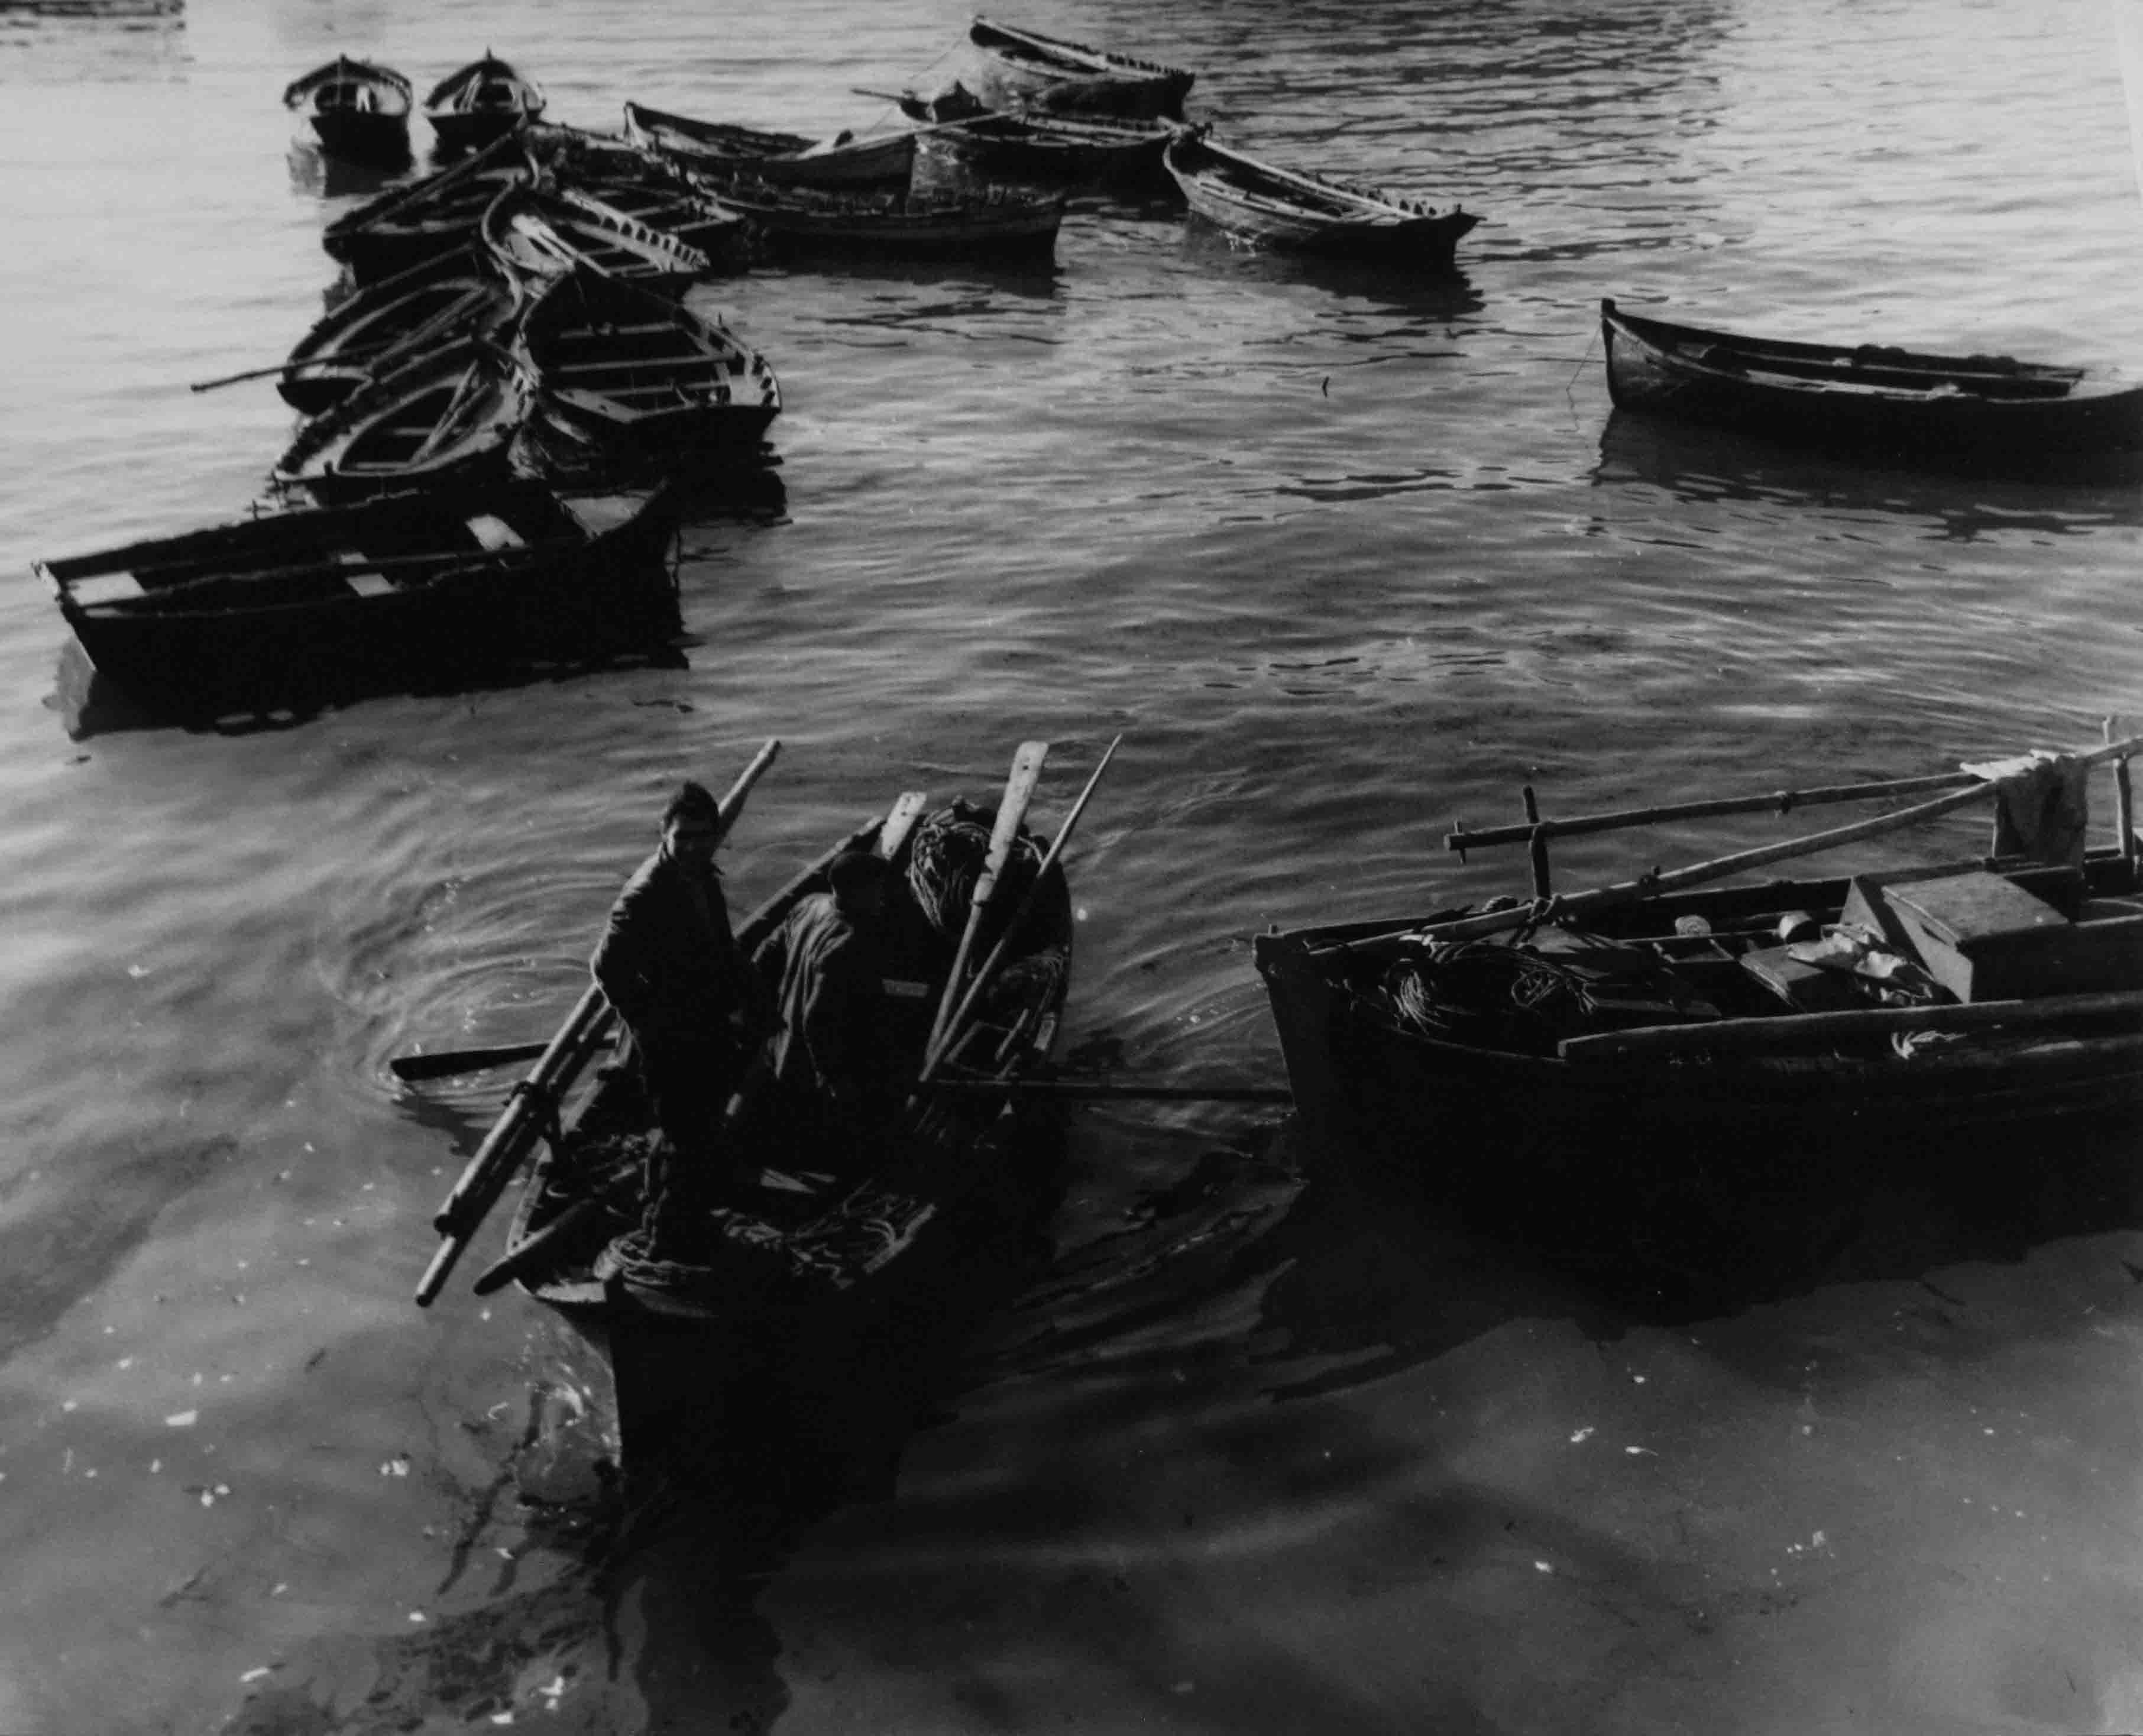 Barcas en Lisboa. Portugal, 1939<br/>Gelatina de plata / Silver gelatin print